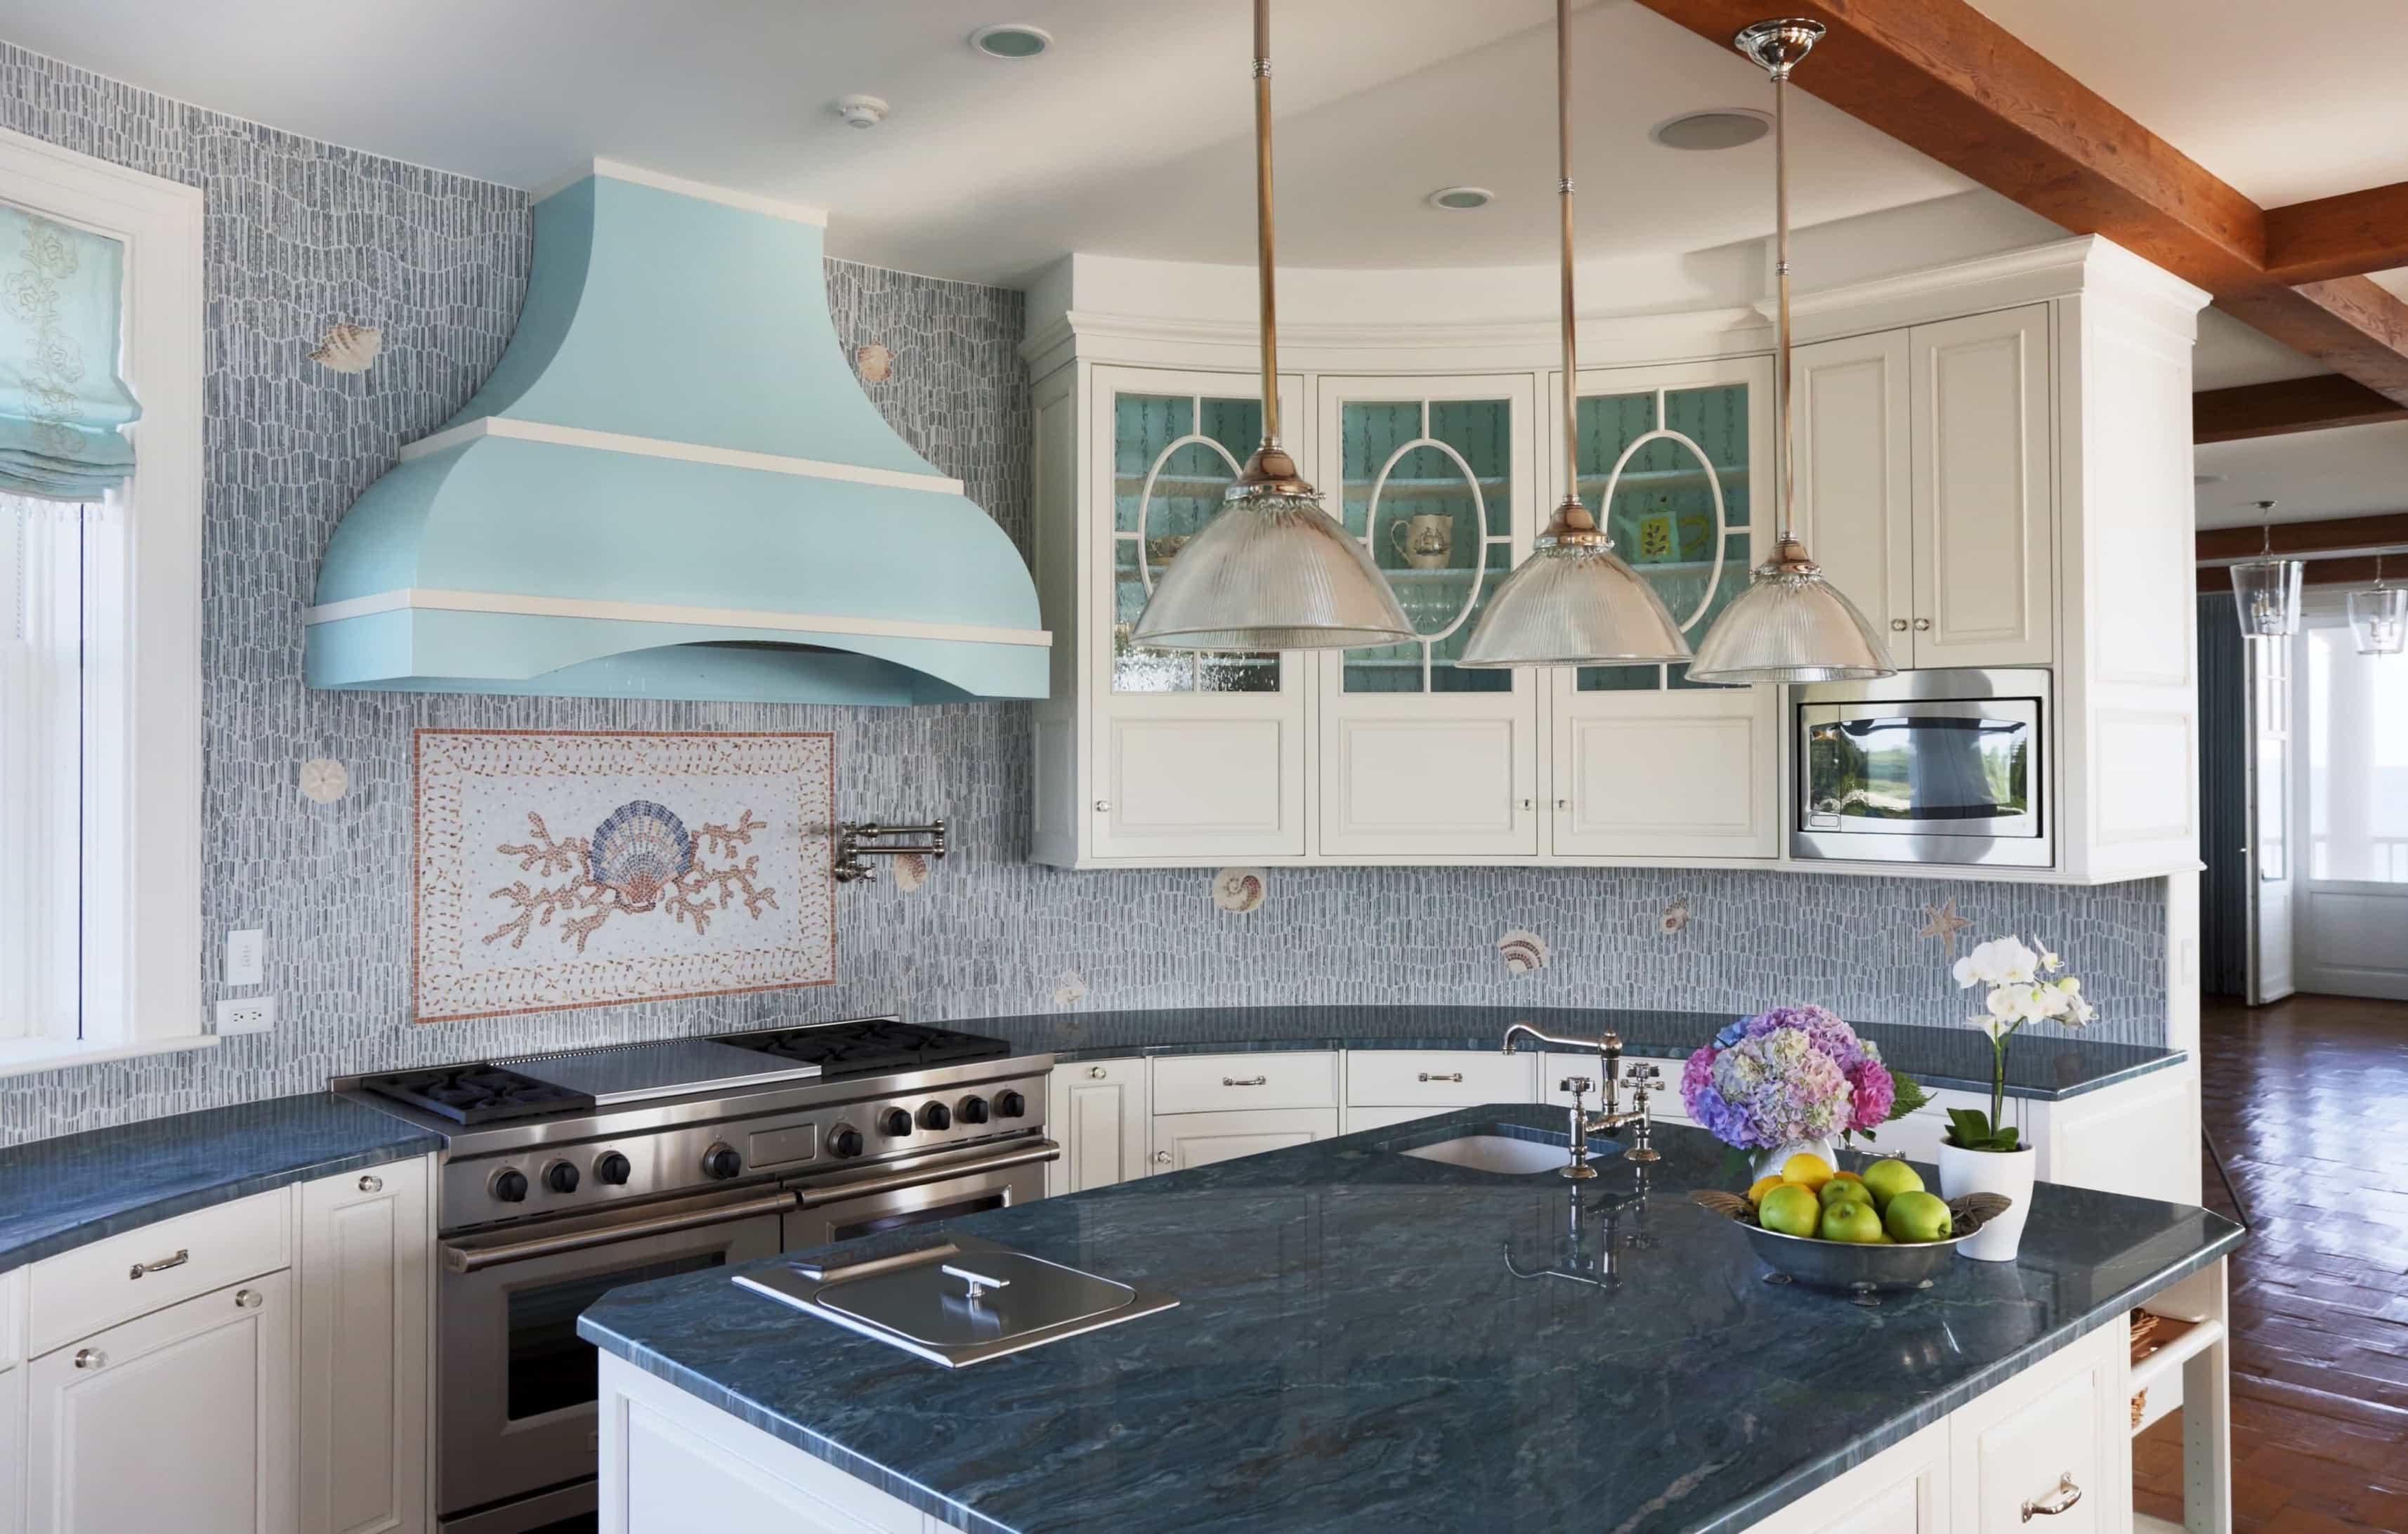 Coastal kitchen backsplash in the chef kitchen 50392 for Nautical kitchen backsplash